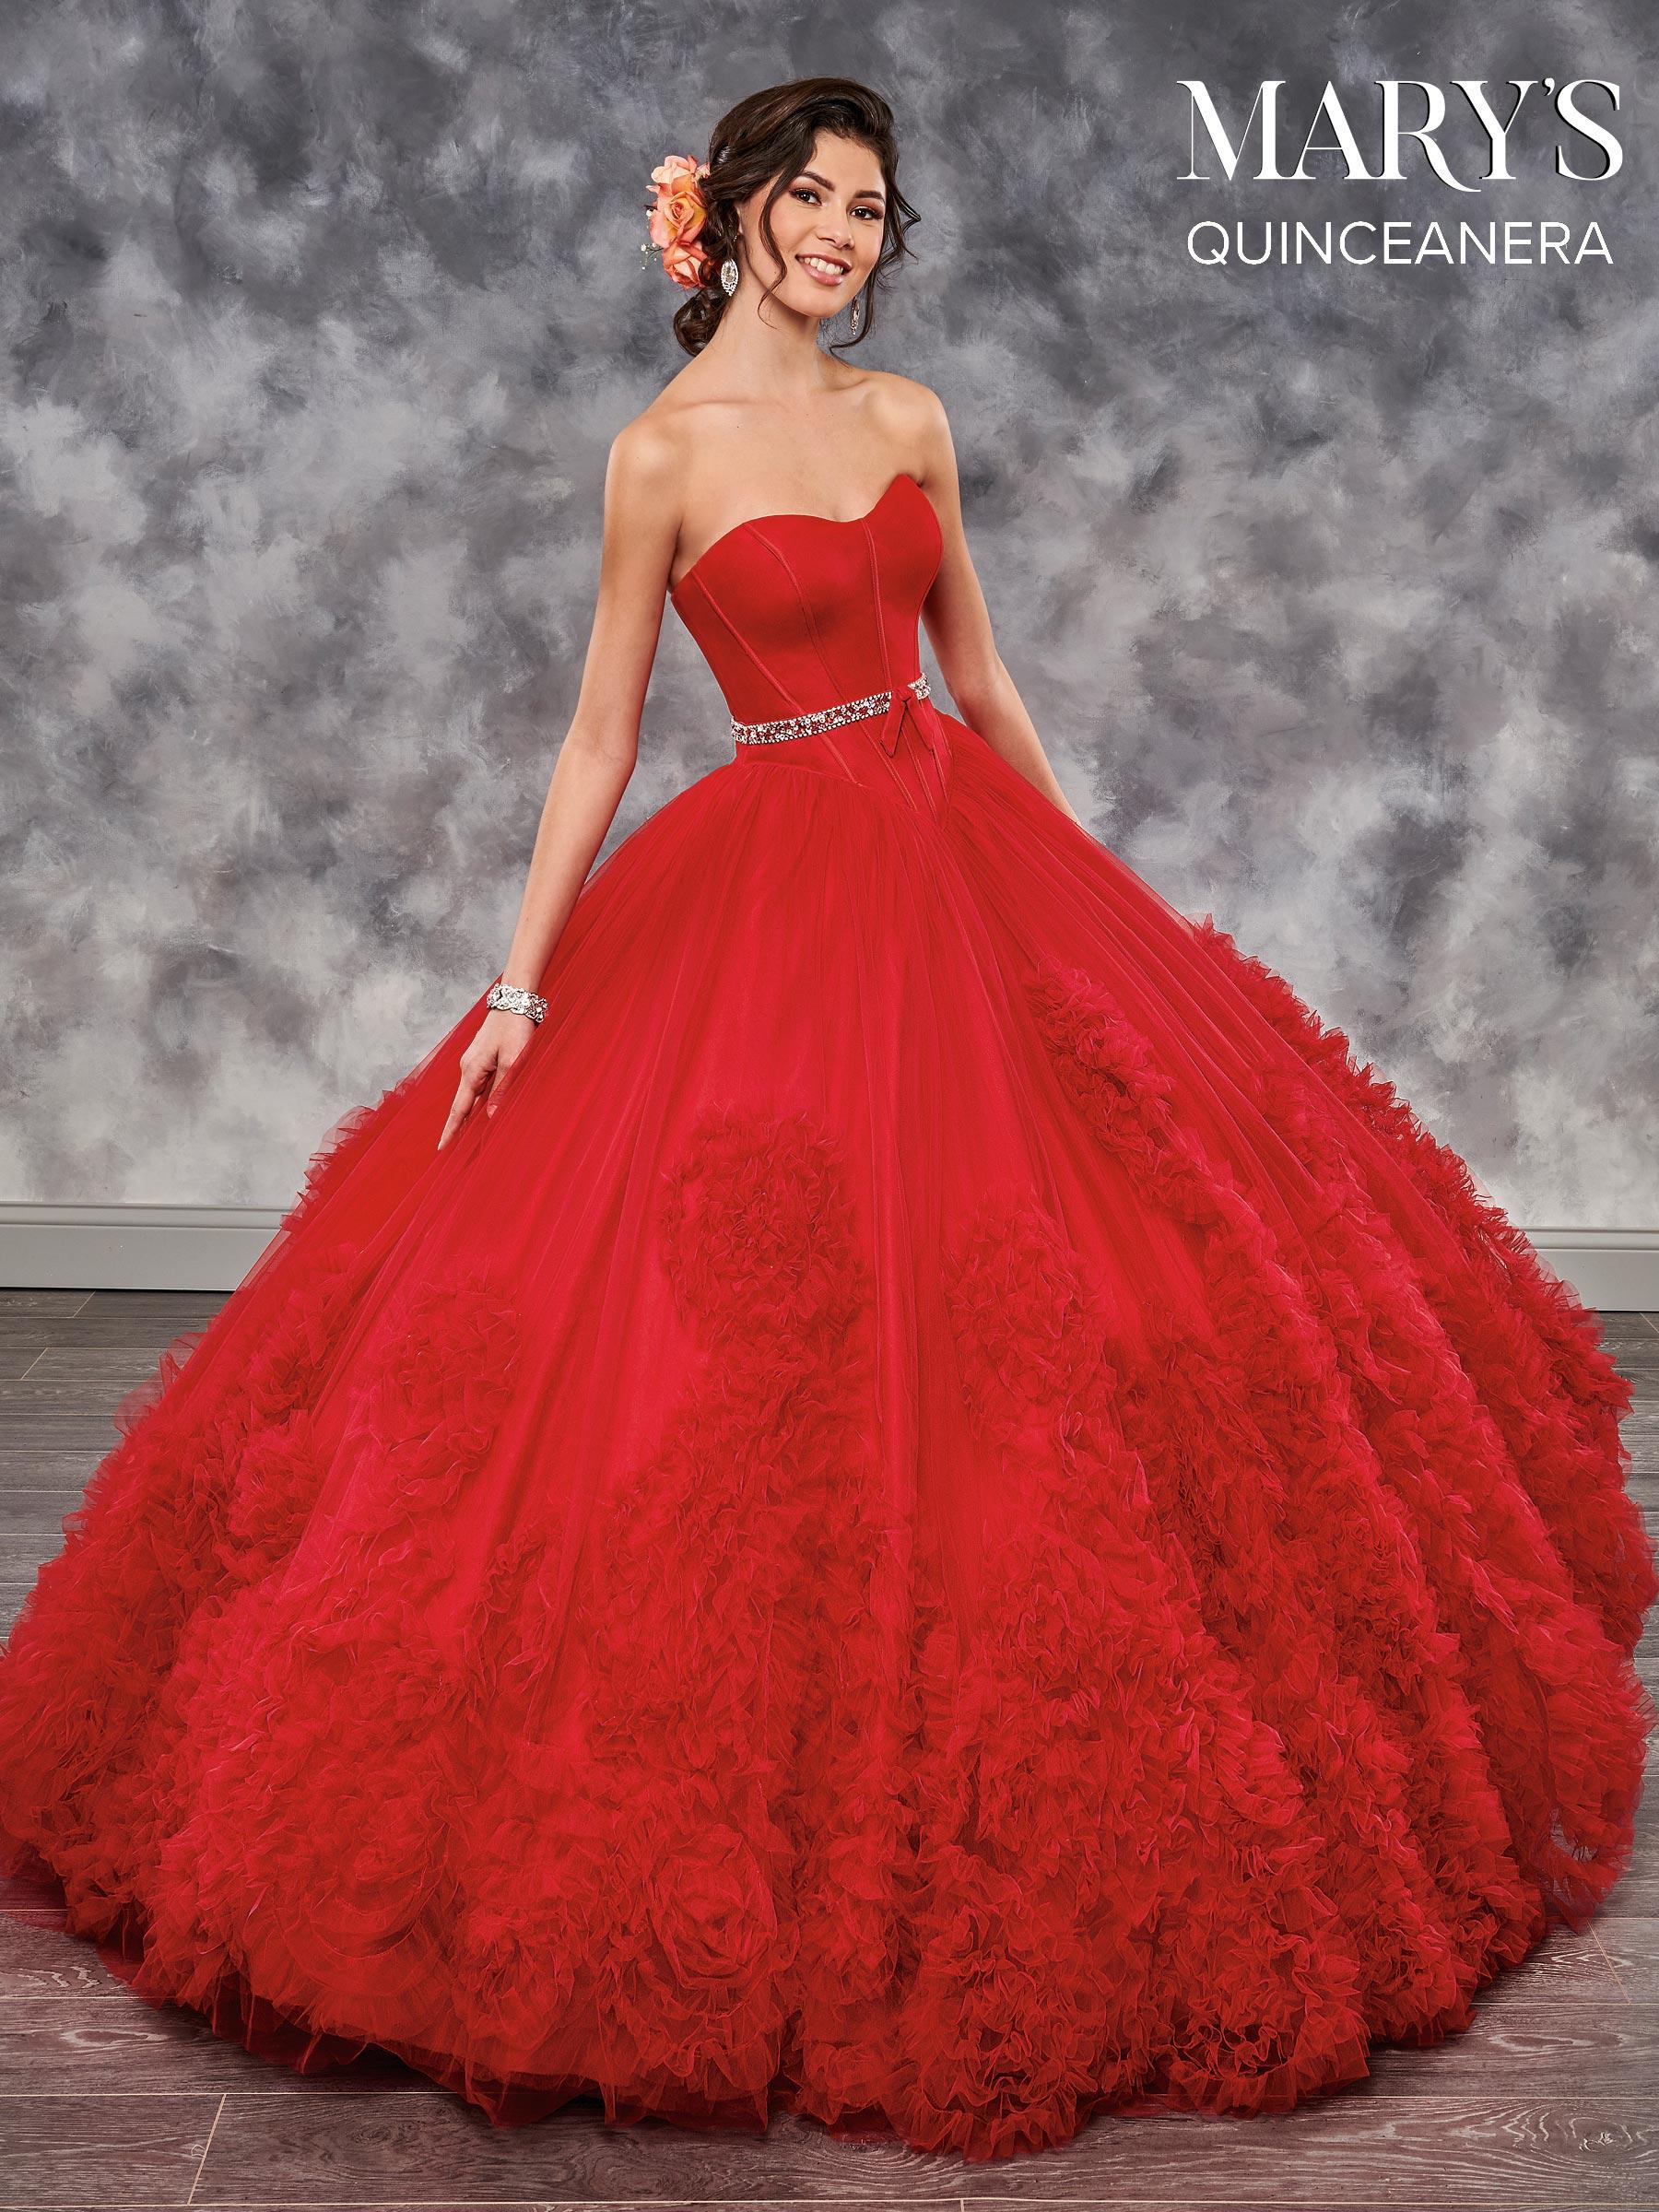 5869c00b1e26 Marys Quinceanera Dresses | Style - MQ2024 in Ivory, Powder Blue ...